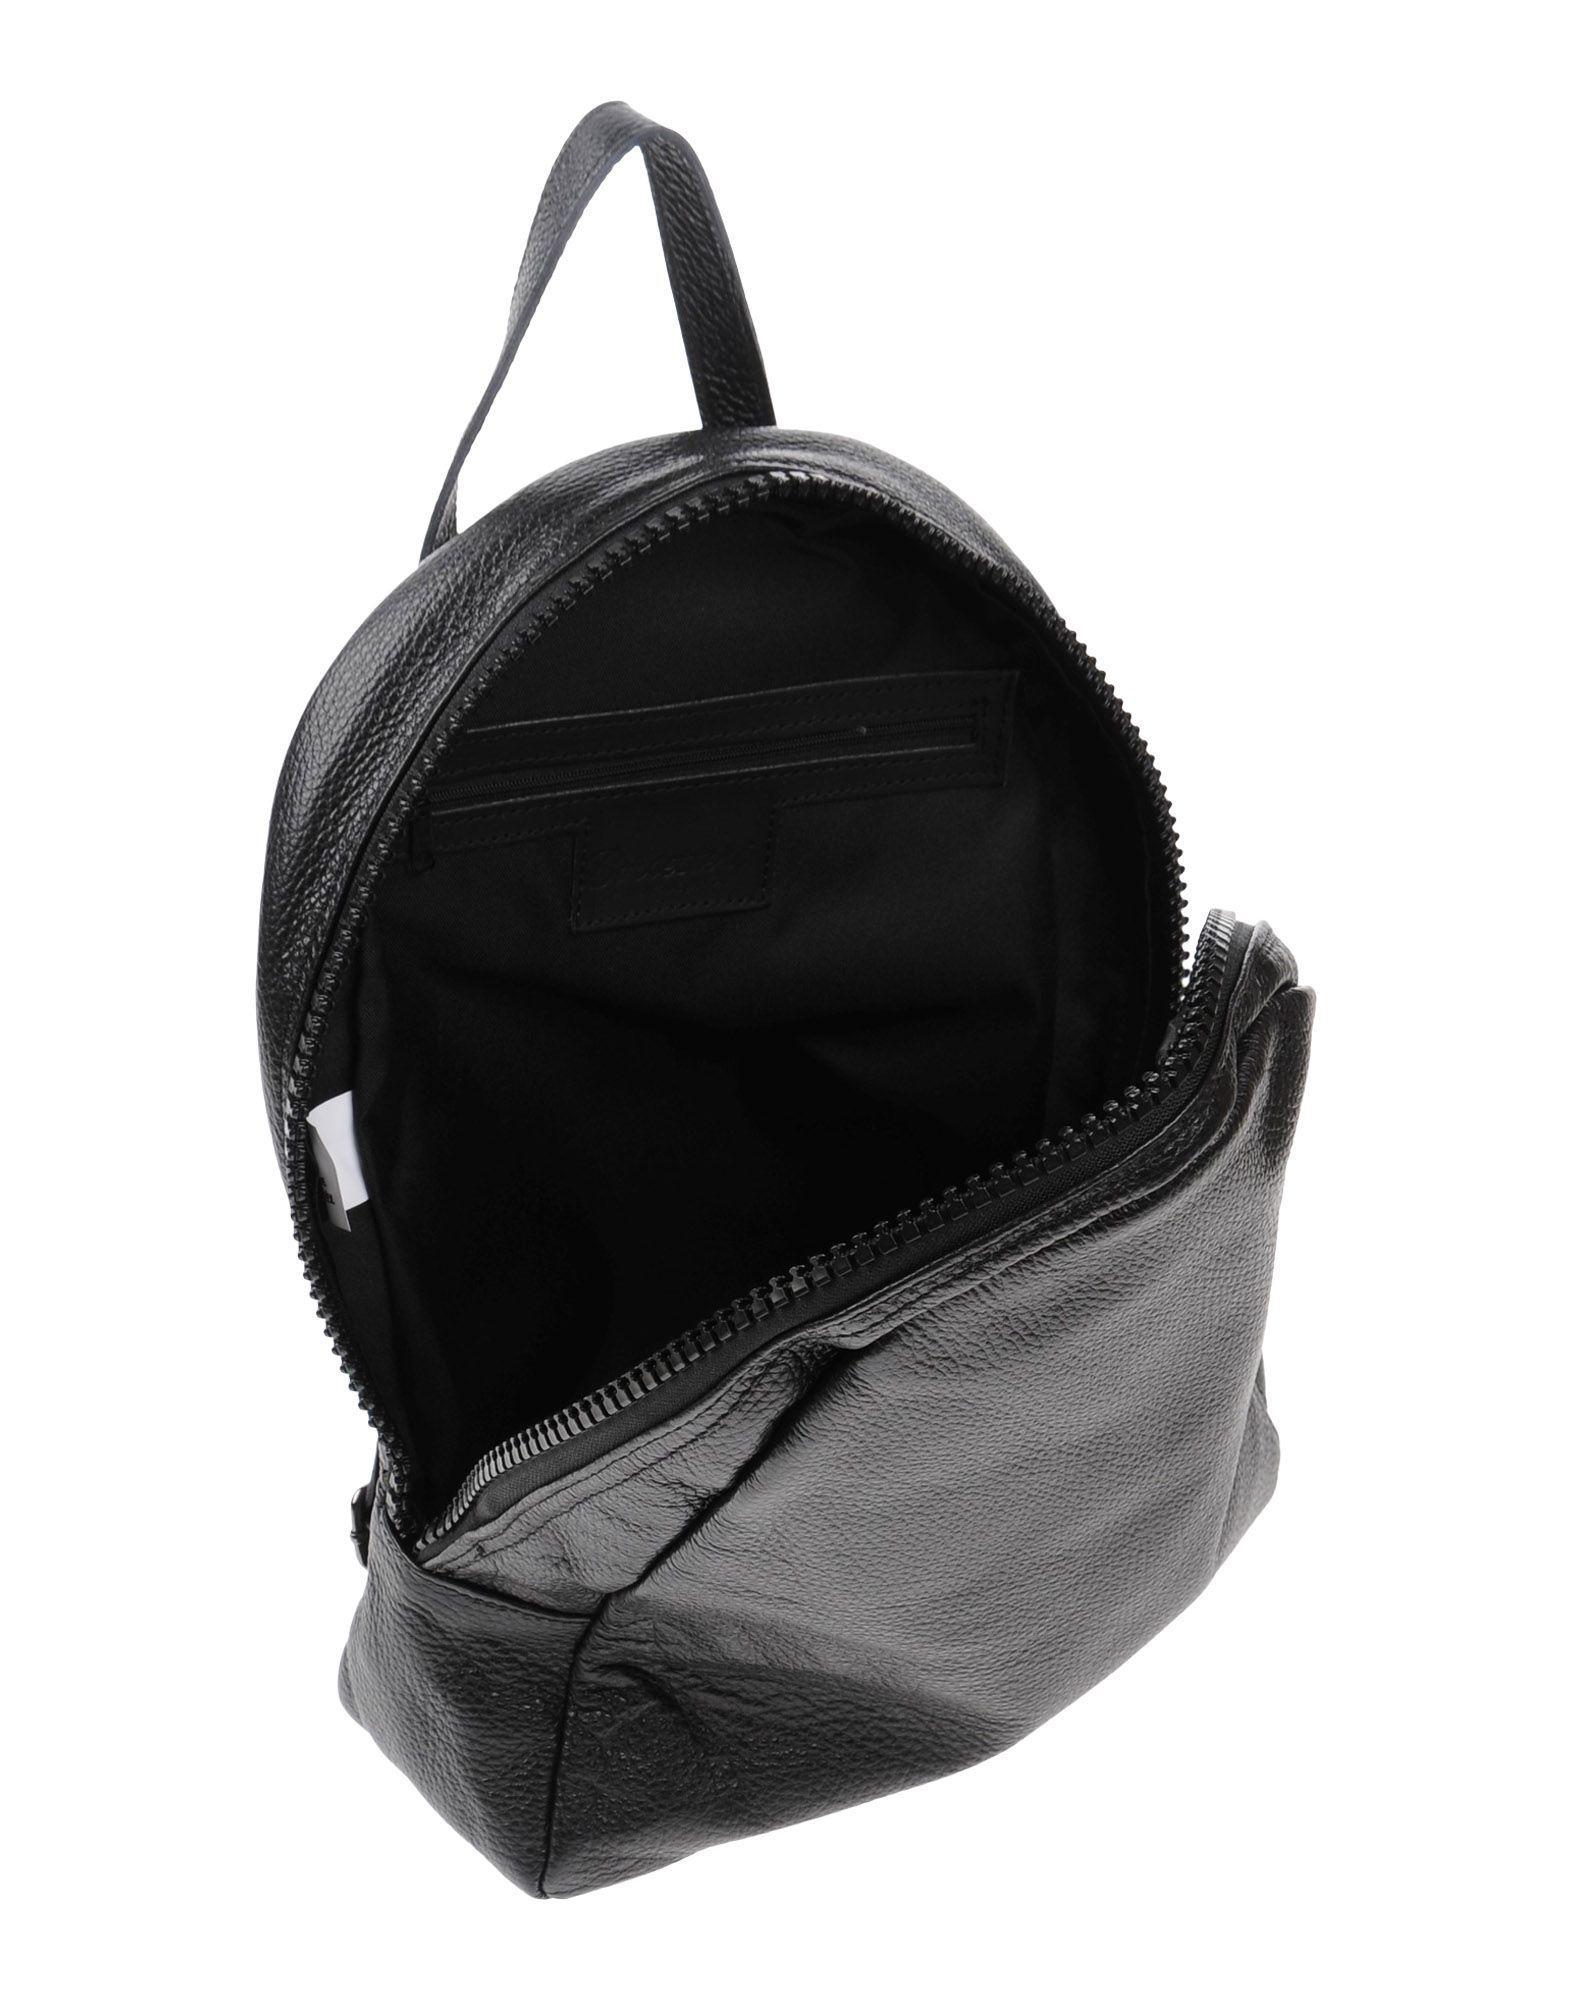 Borsetteria Napoli 1985 Leather Backpacks & Fanny Packs in Black